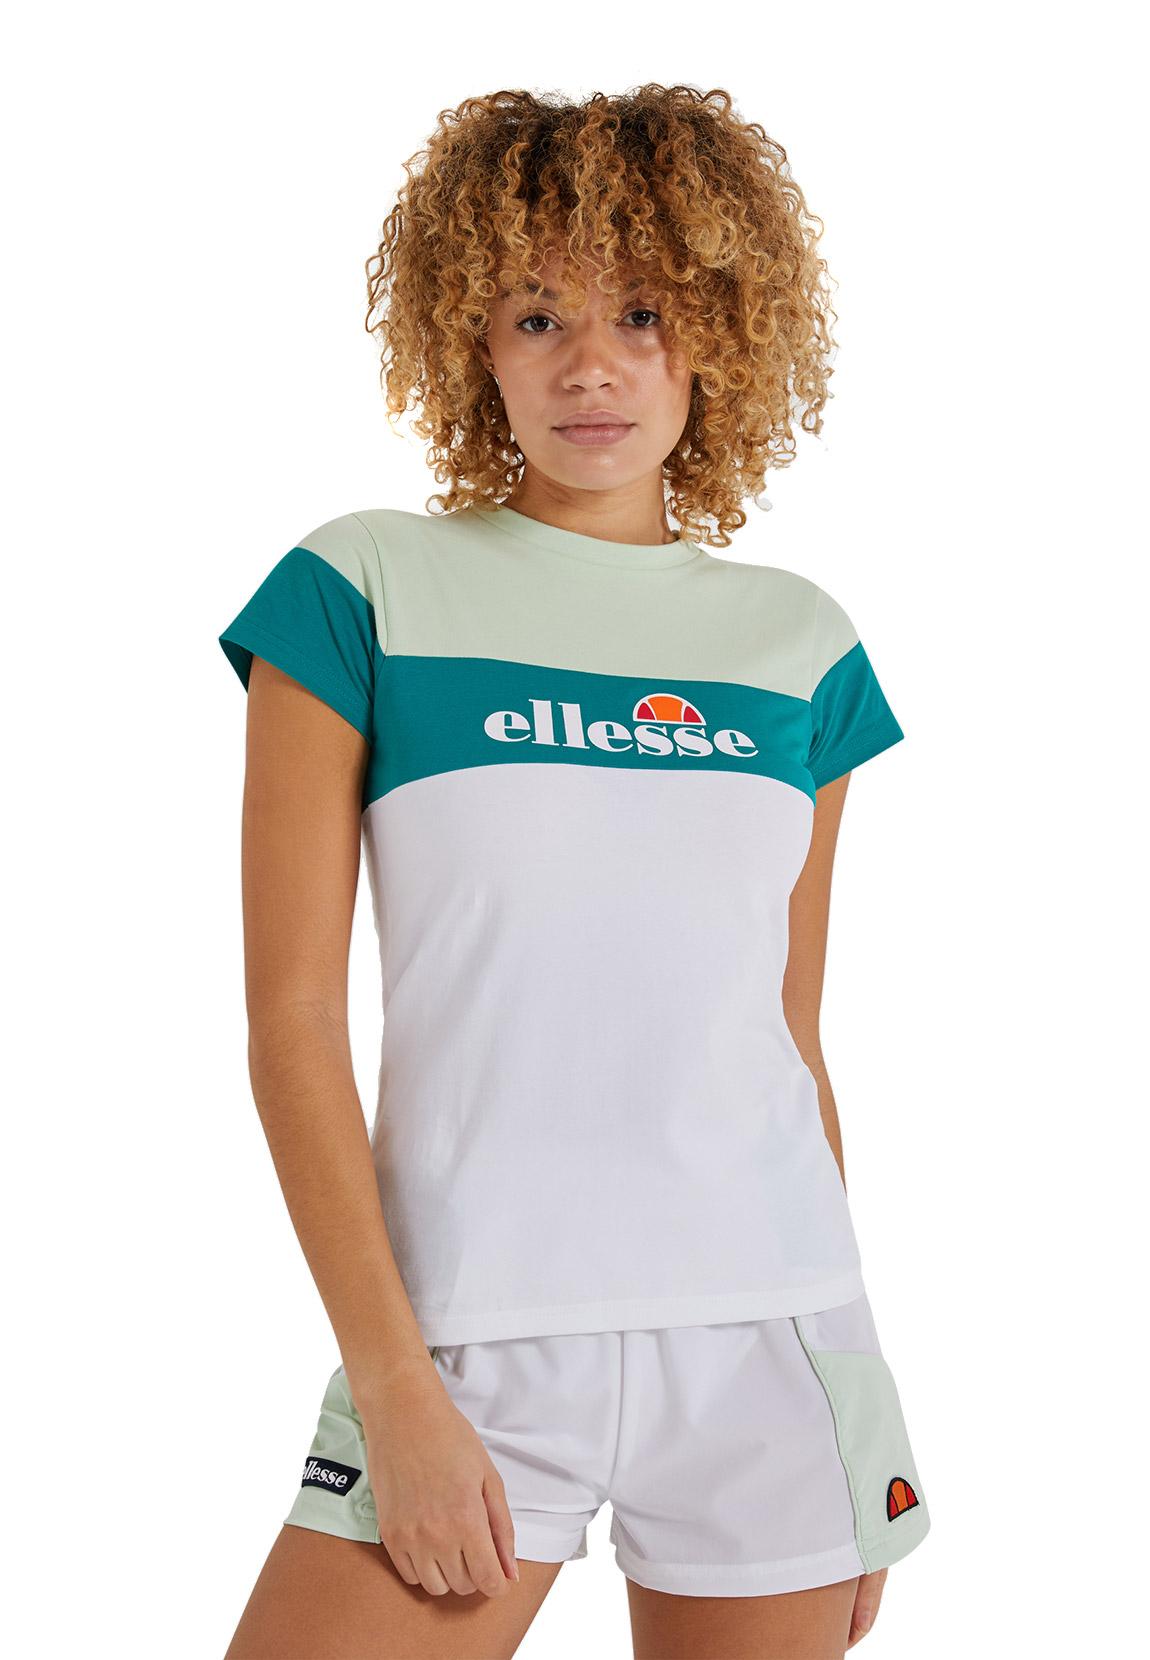 Ellesse T-Shirt Damen CAKE TEE White Weiß Grün